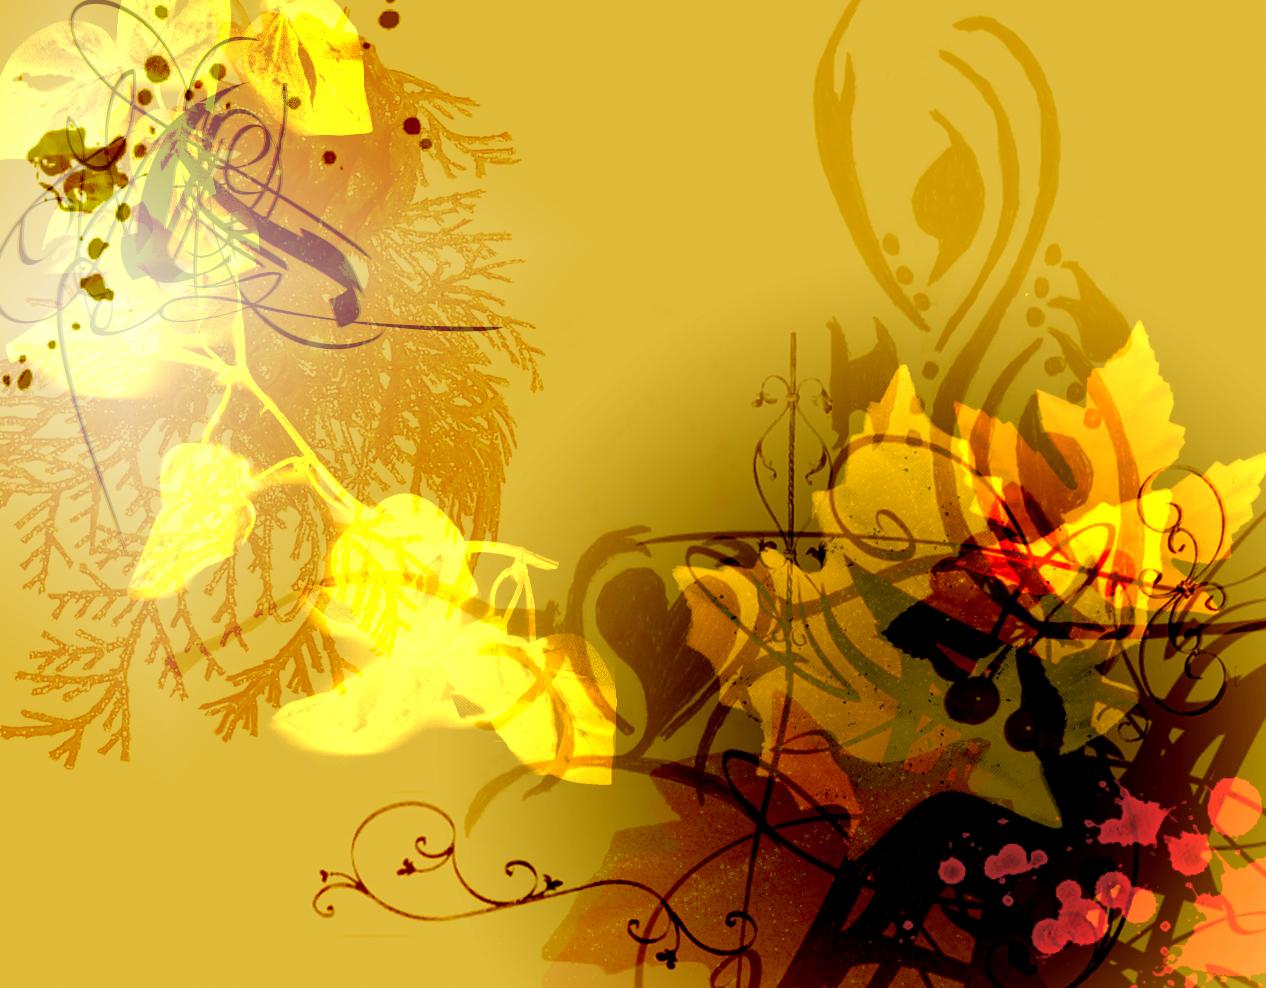 http://3.bp.blogspot.com/-bMlE1Xnb-WY/T9qvdN5wYrI/AAAAAAAAA20/PbZgSS5qOAU/s1600/Autumn-Wallpaper-10.jpg